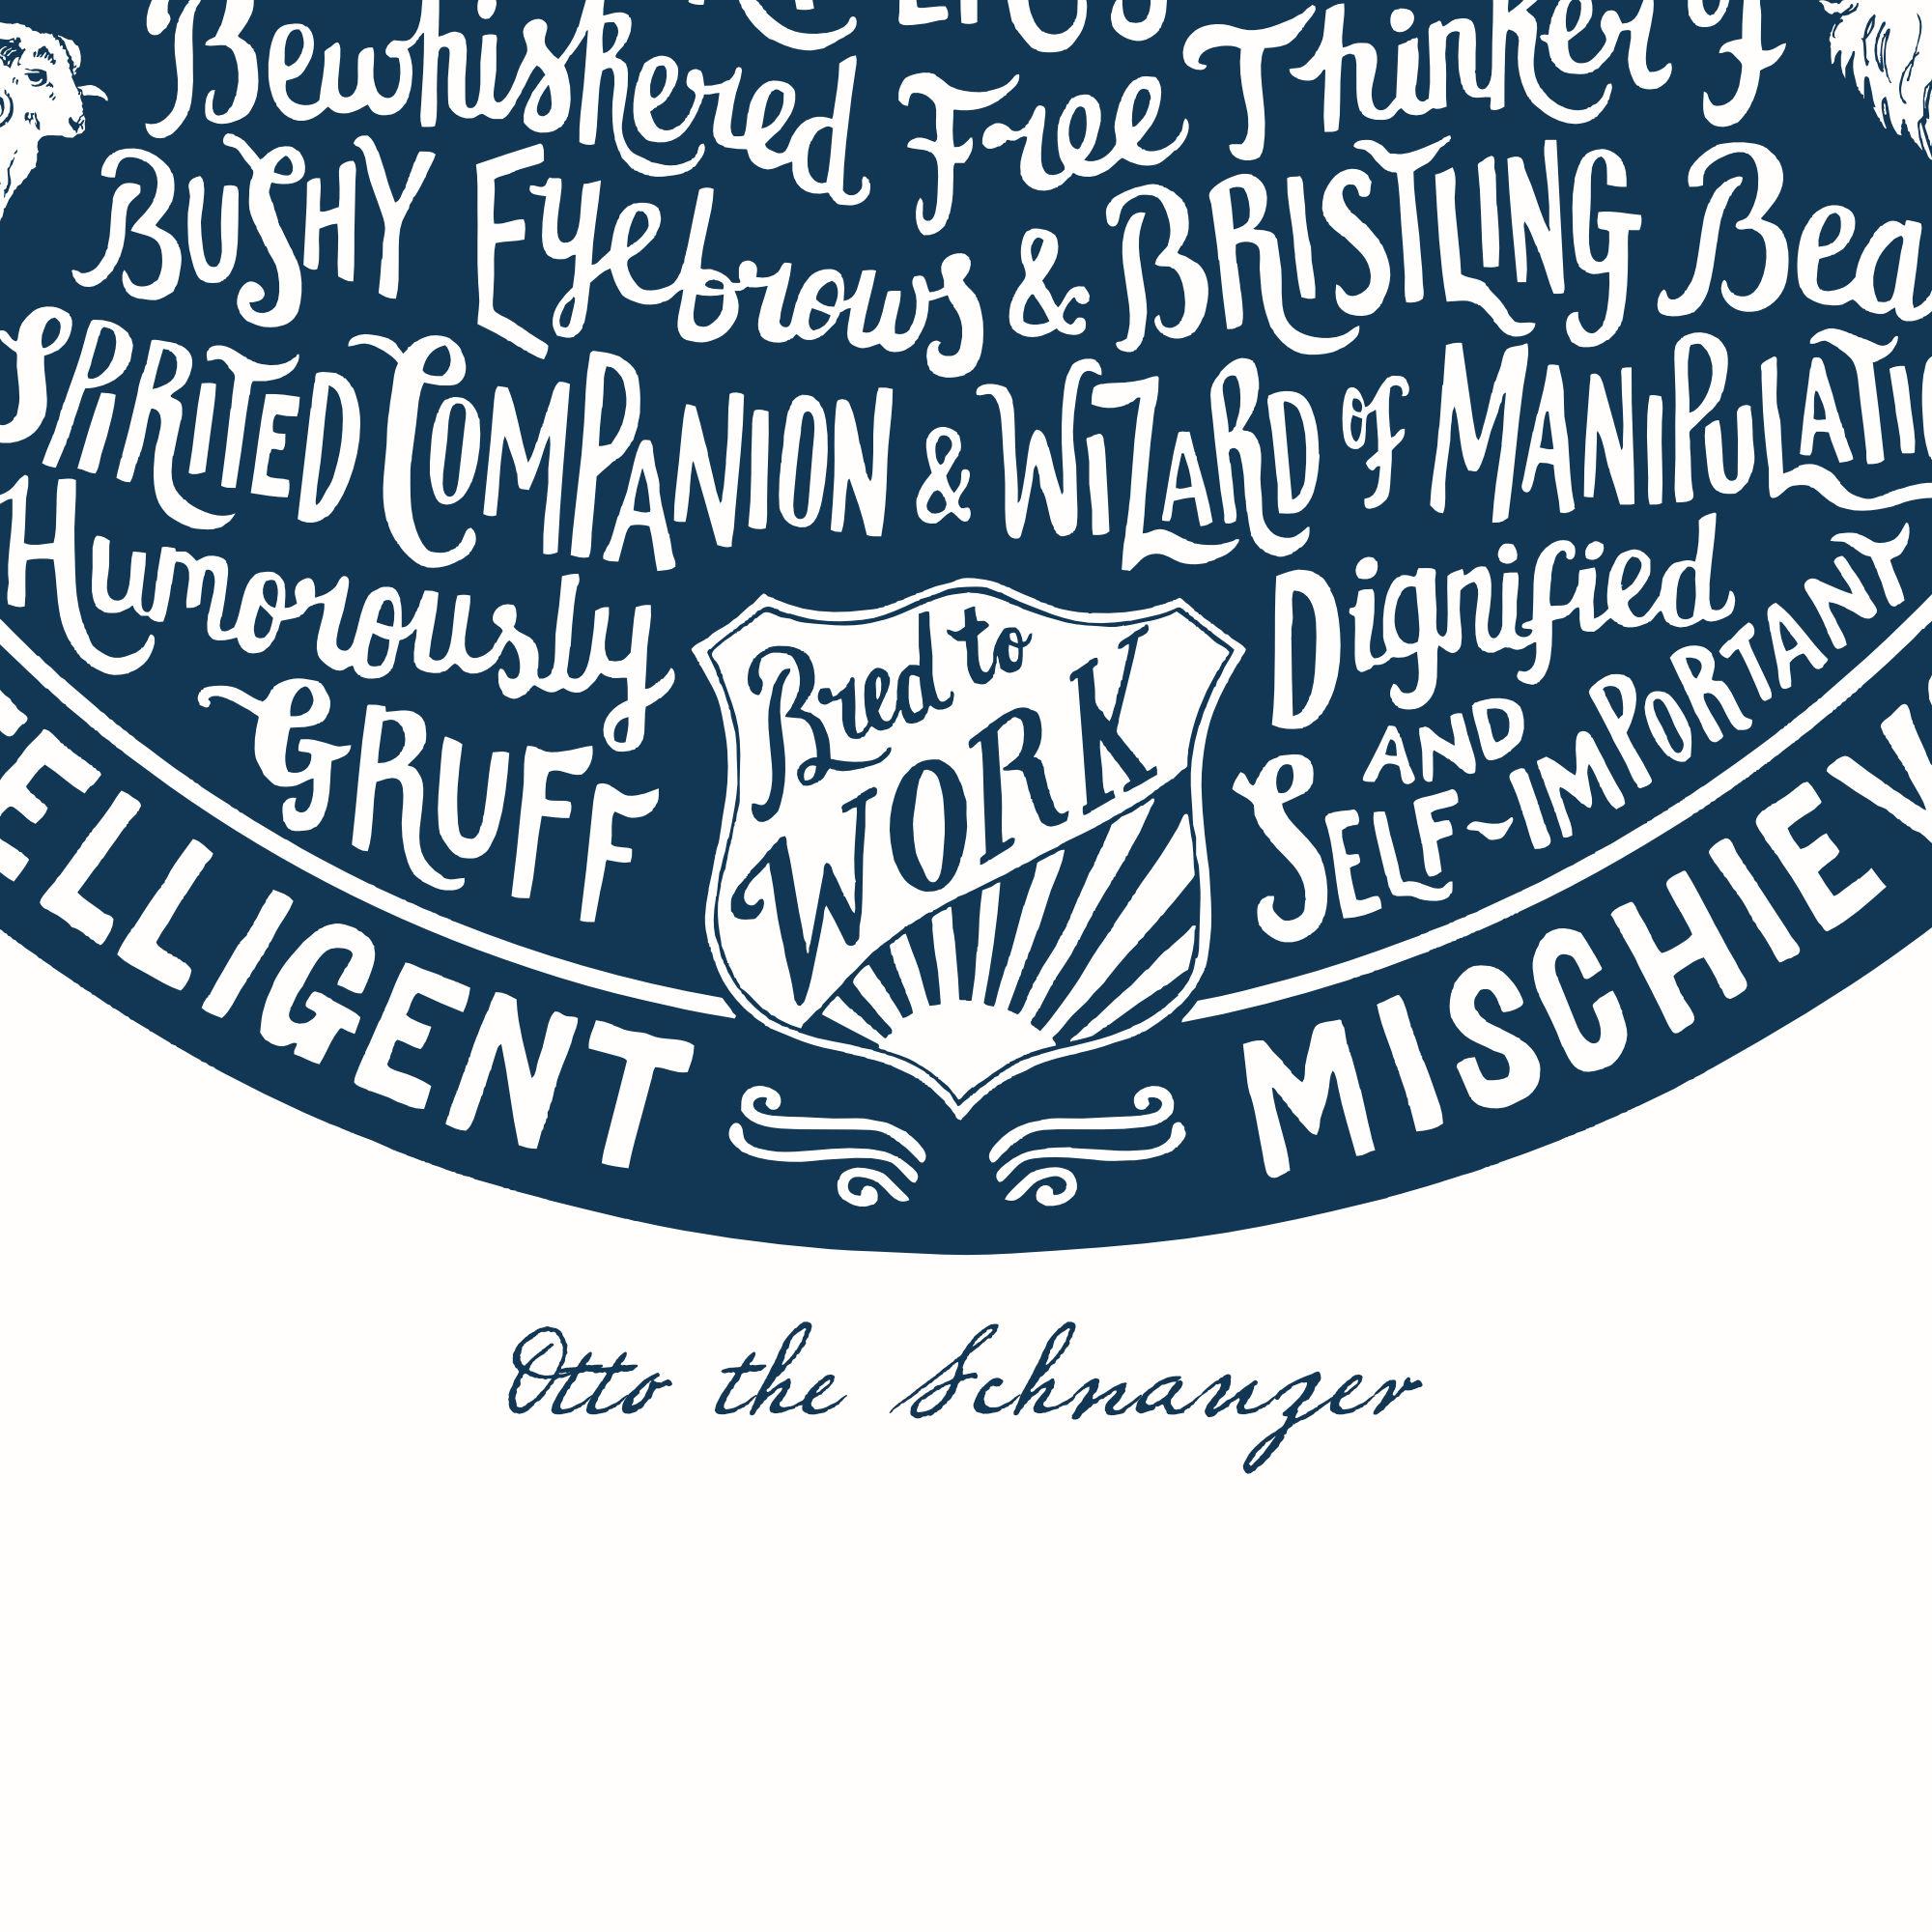 Personalised Schnauzer Print | The Enlightened Hound